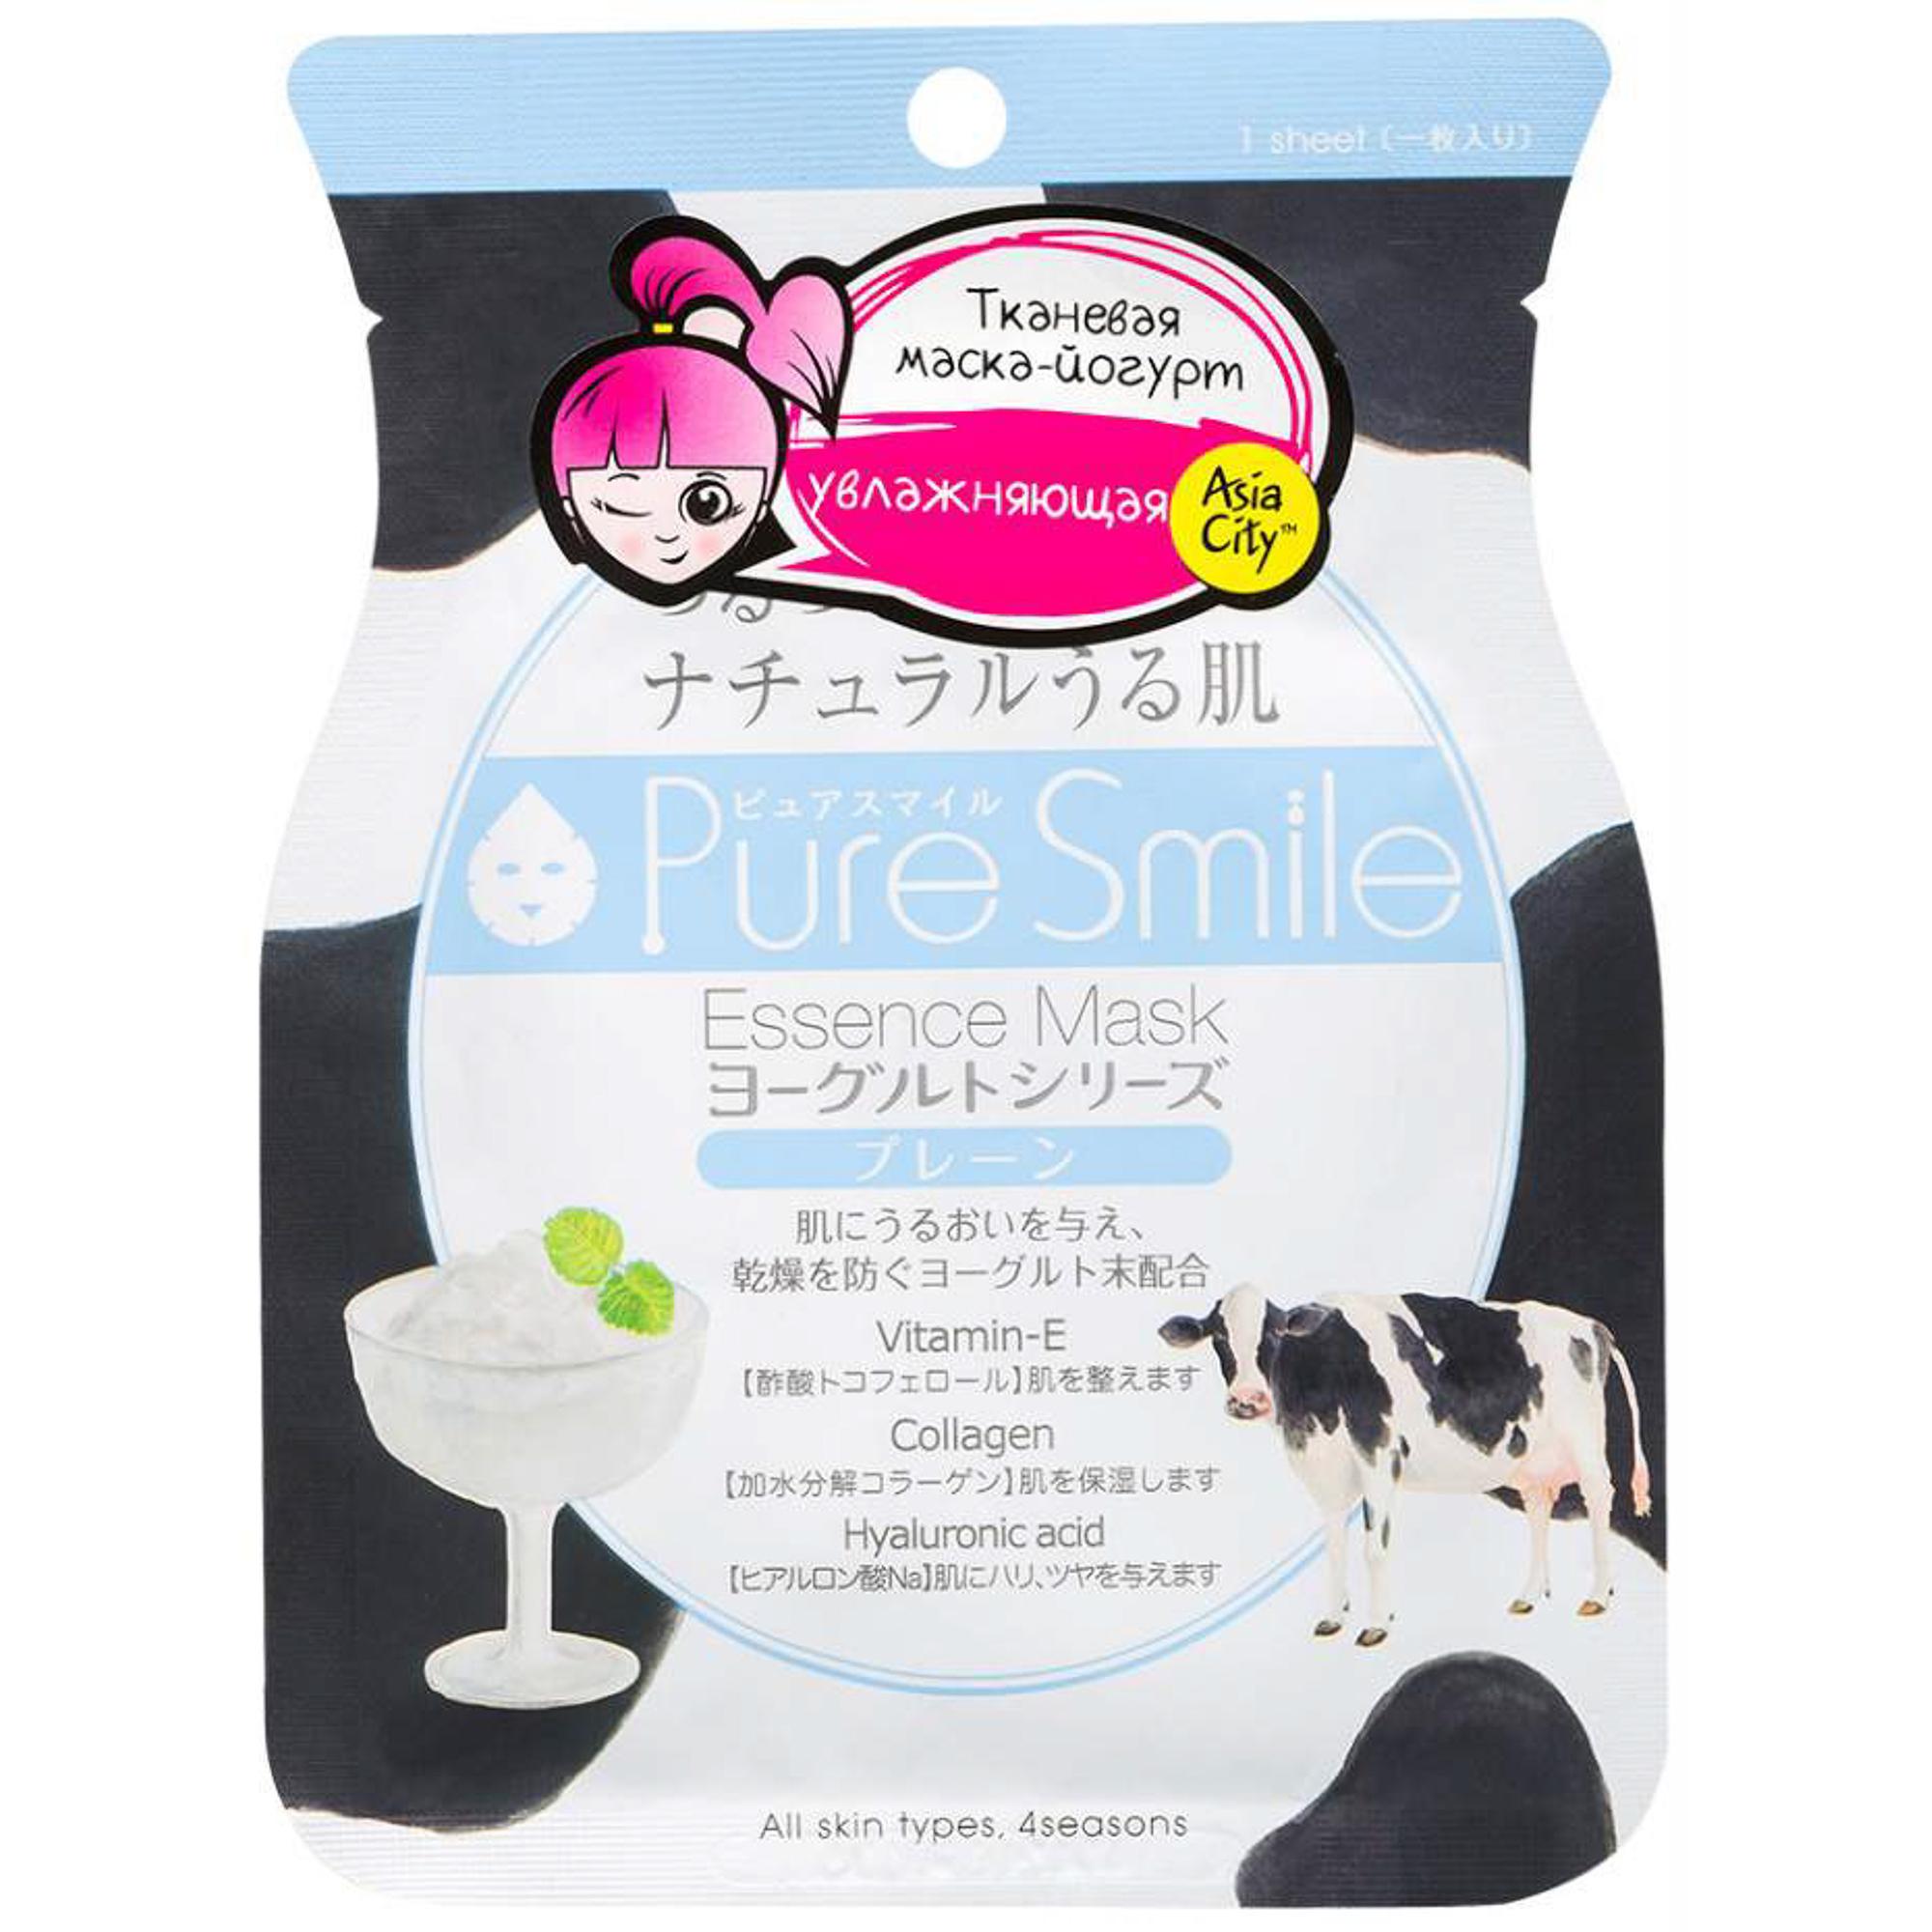 Маска для лица SunSmile Pure Smile с экстрактом отрубей, 23 мл фото